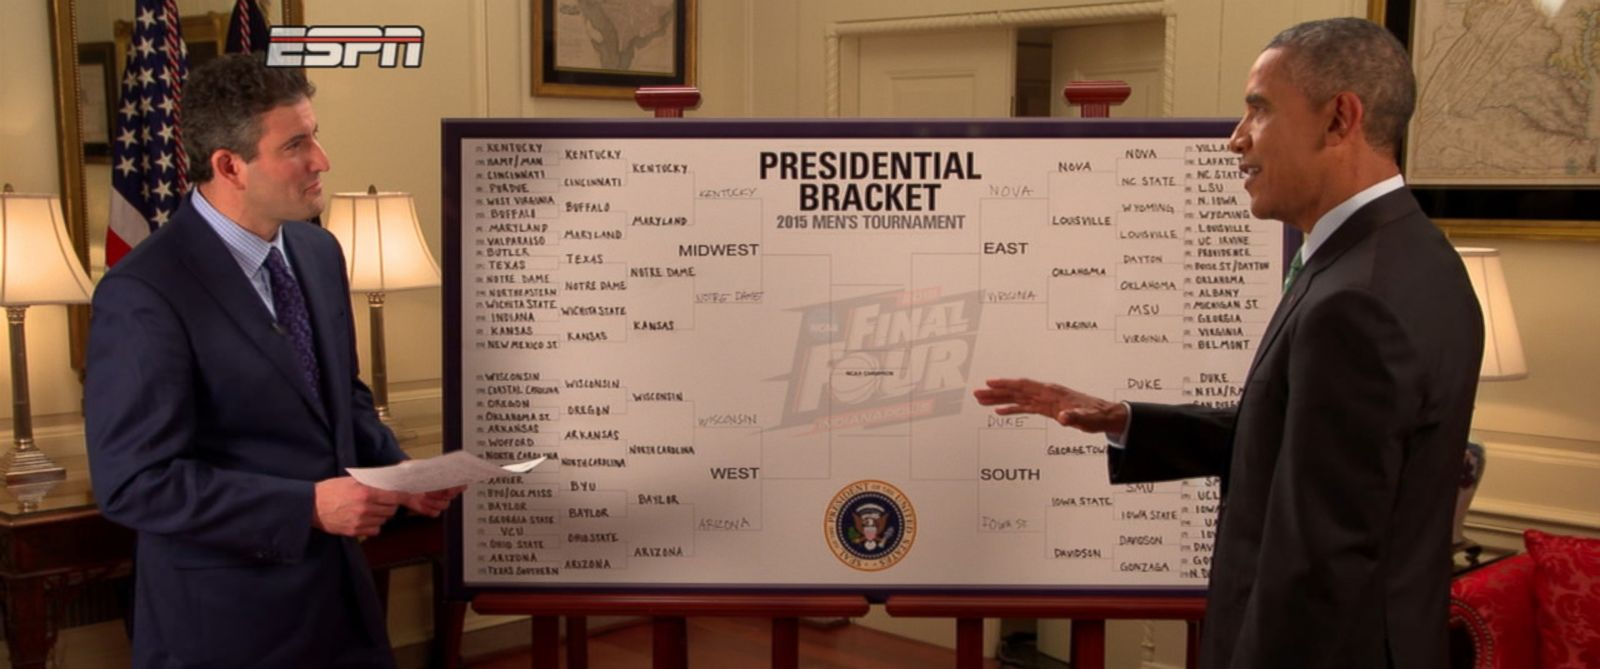 PHOTO: President Barack Obama discusses his NCAA picks with ESPNs Andy Katz.